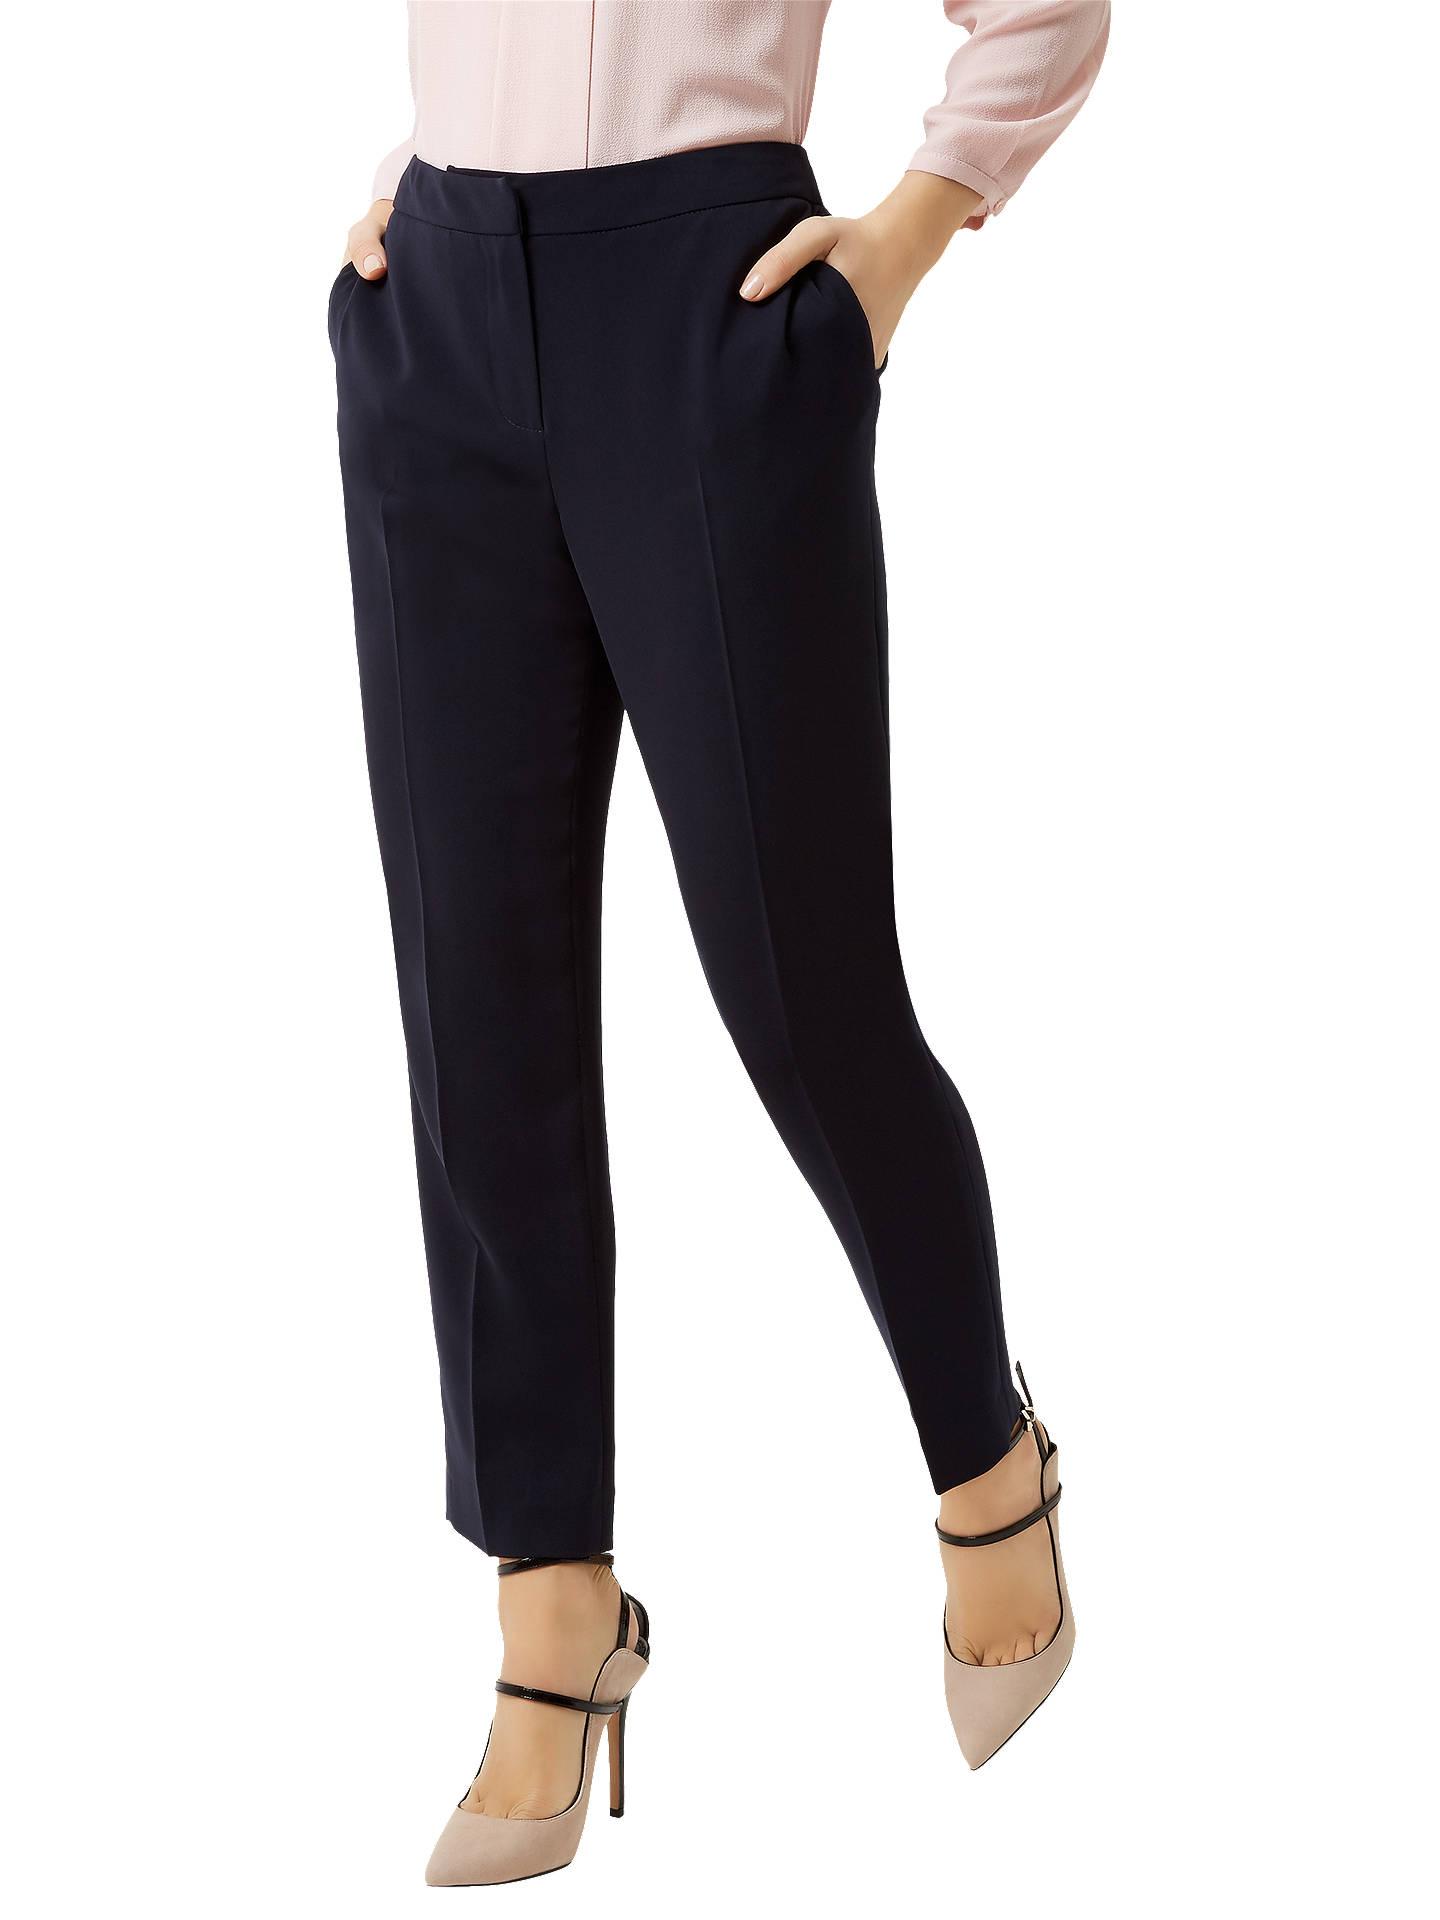 9c273bf79e28 Buy Fenn Wright Manson Petite Harper Trousers, Navy, 8 Online at  johnlewis.com ...